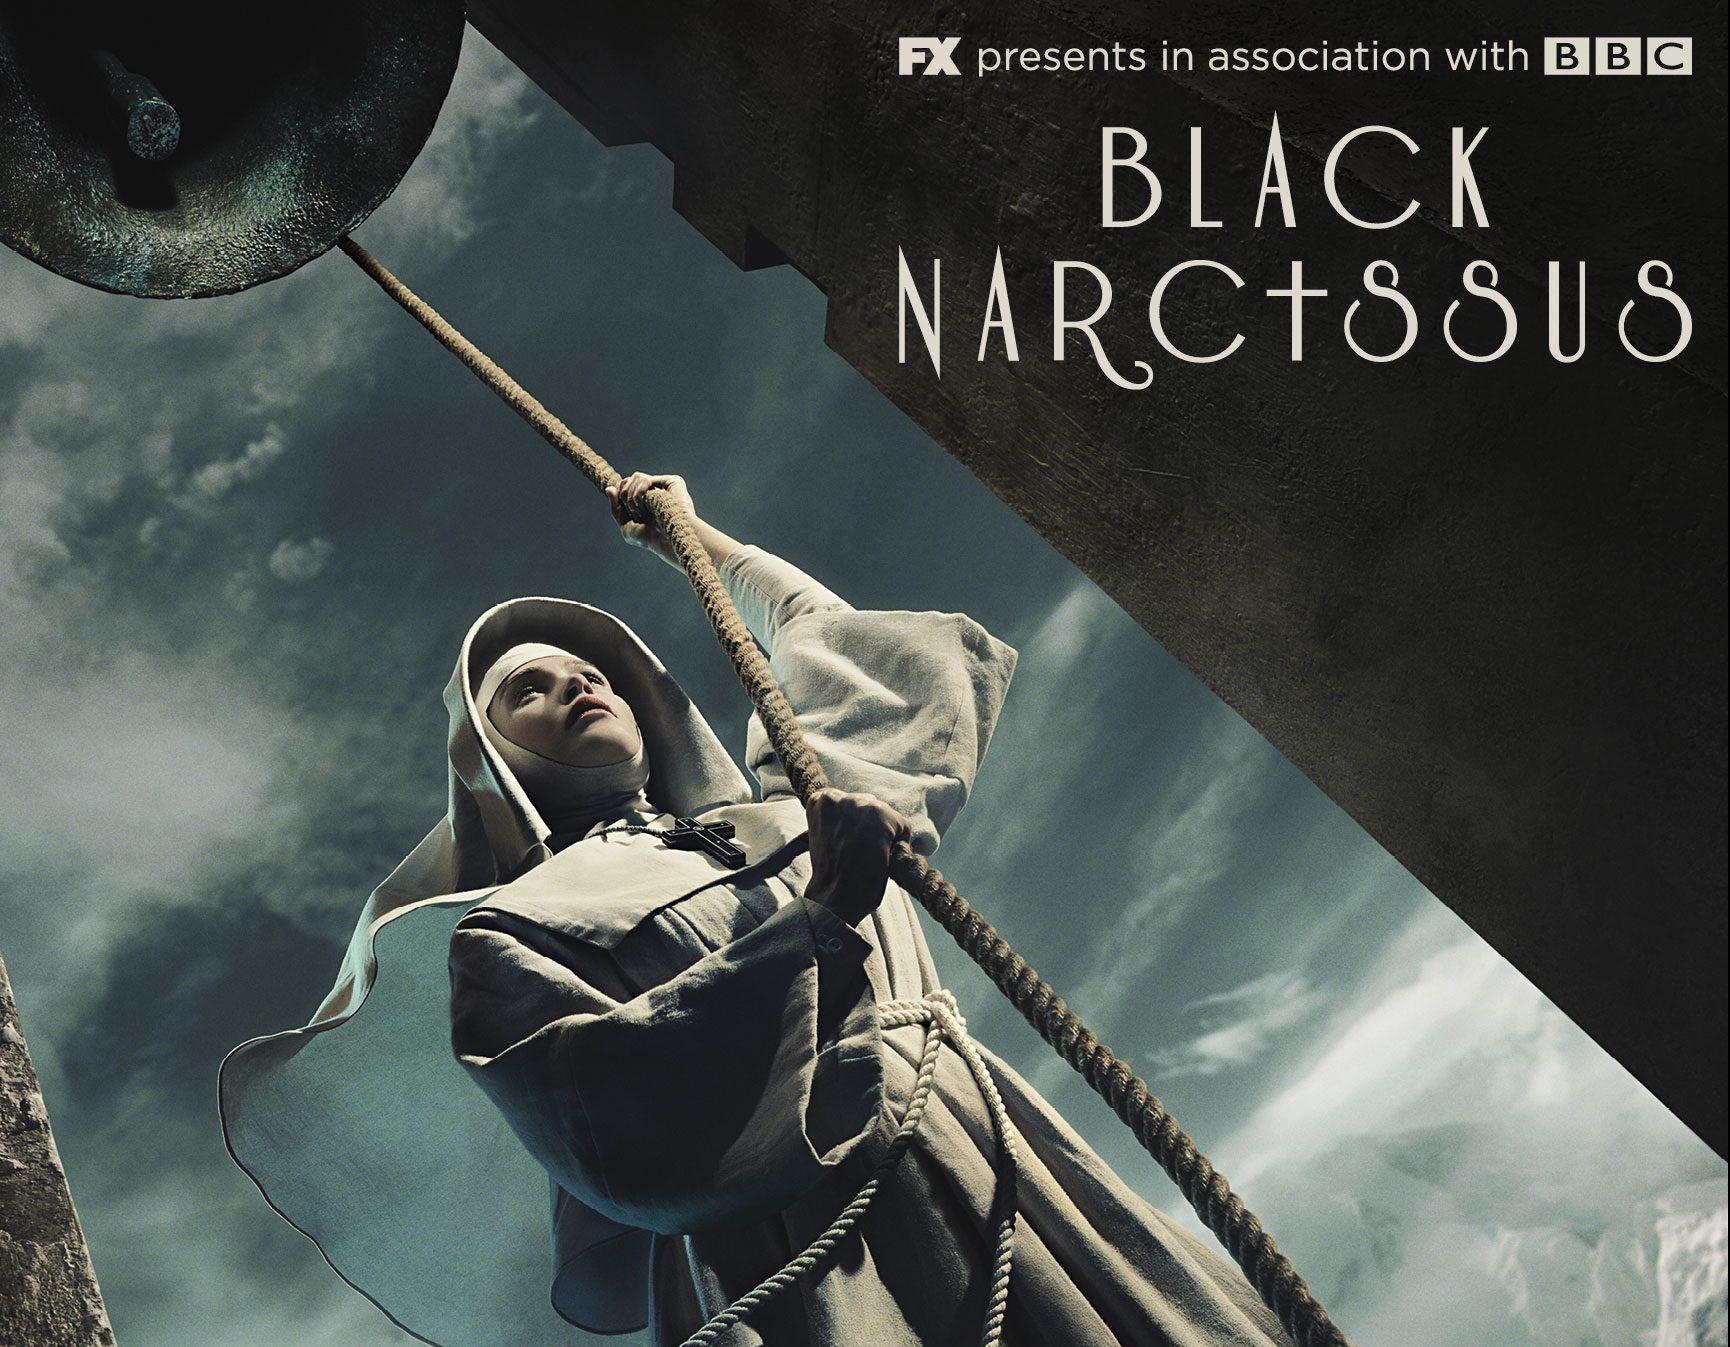 Black Narcissus: Avance de la miniserie protagonizada por Gemma Arterton